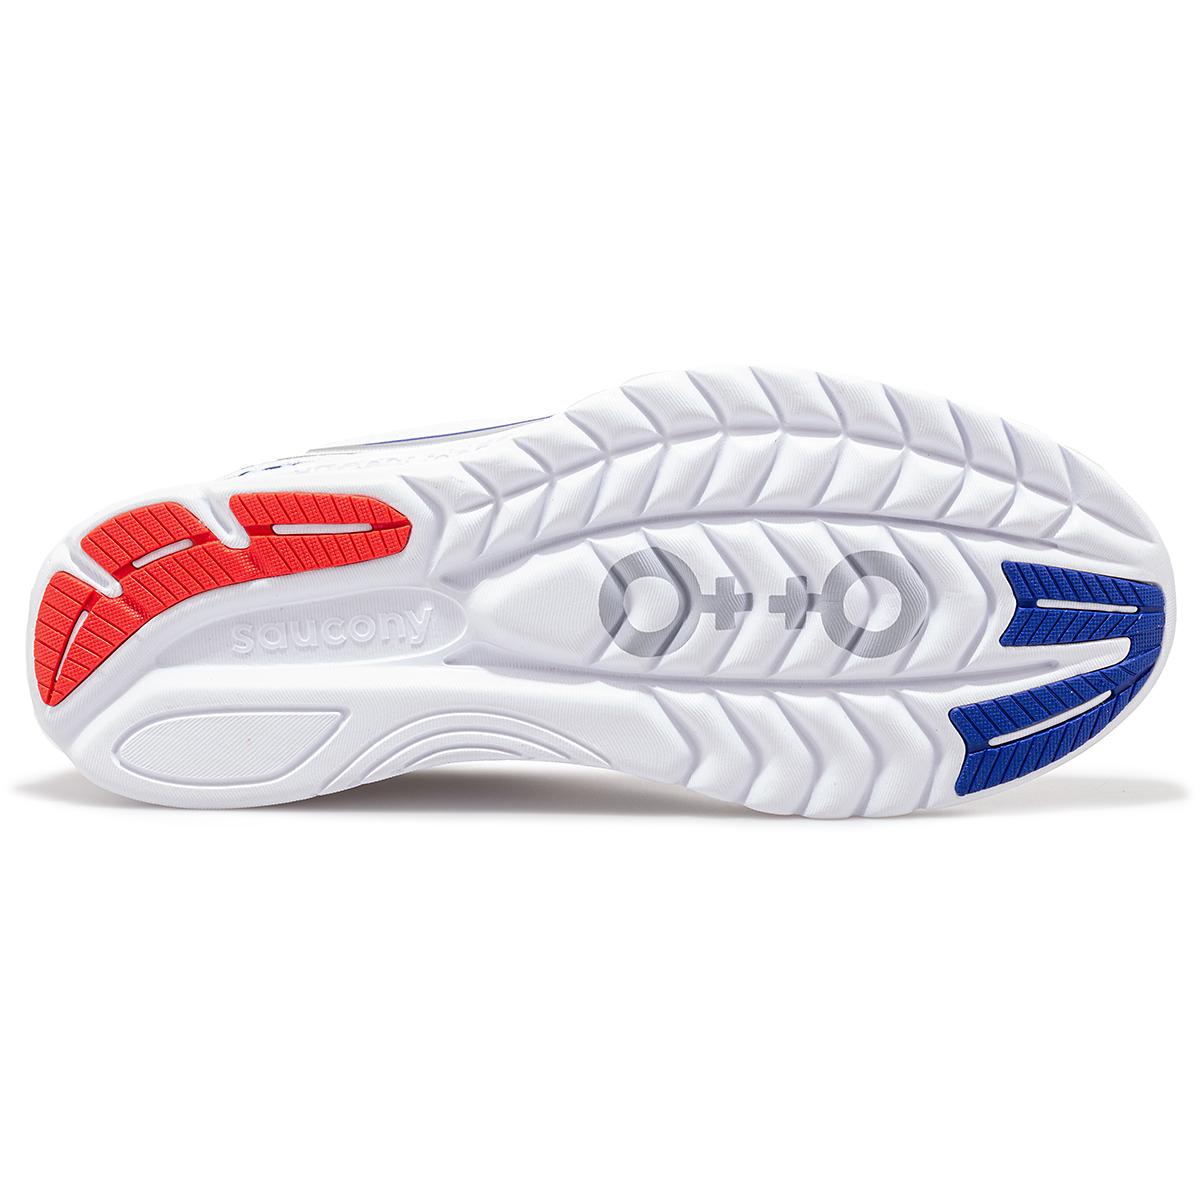 Women's Saucony x Prinkshop Hero Kinvara 11 Running Shoe - Color: Red/White/Blue - Size: 5 - Width: Regular, Red/White/Blue, large, image 4